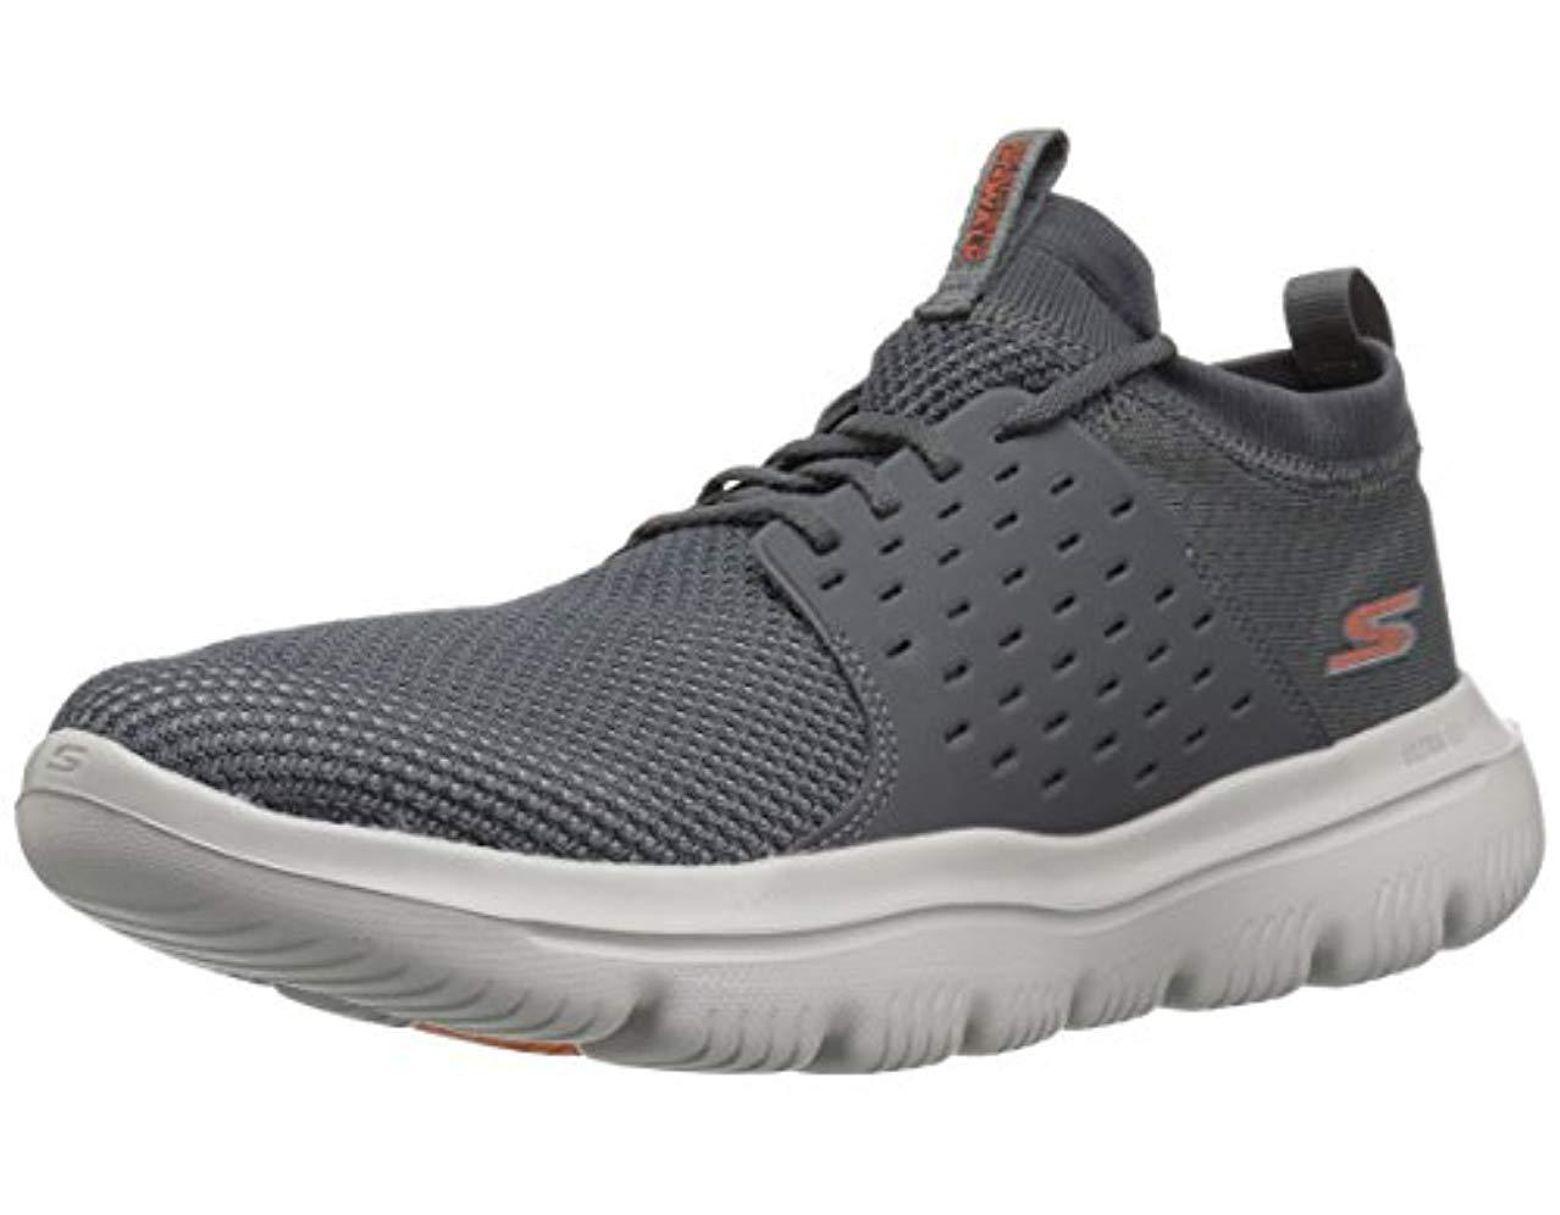 dc439884c155a Men's Gray Go Walk Evolution Ultra Turbo Sneaker